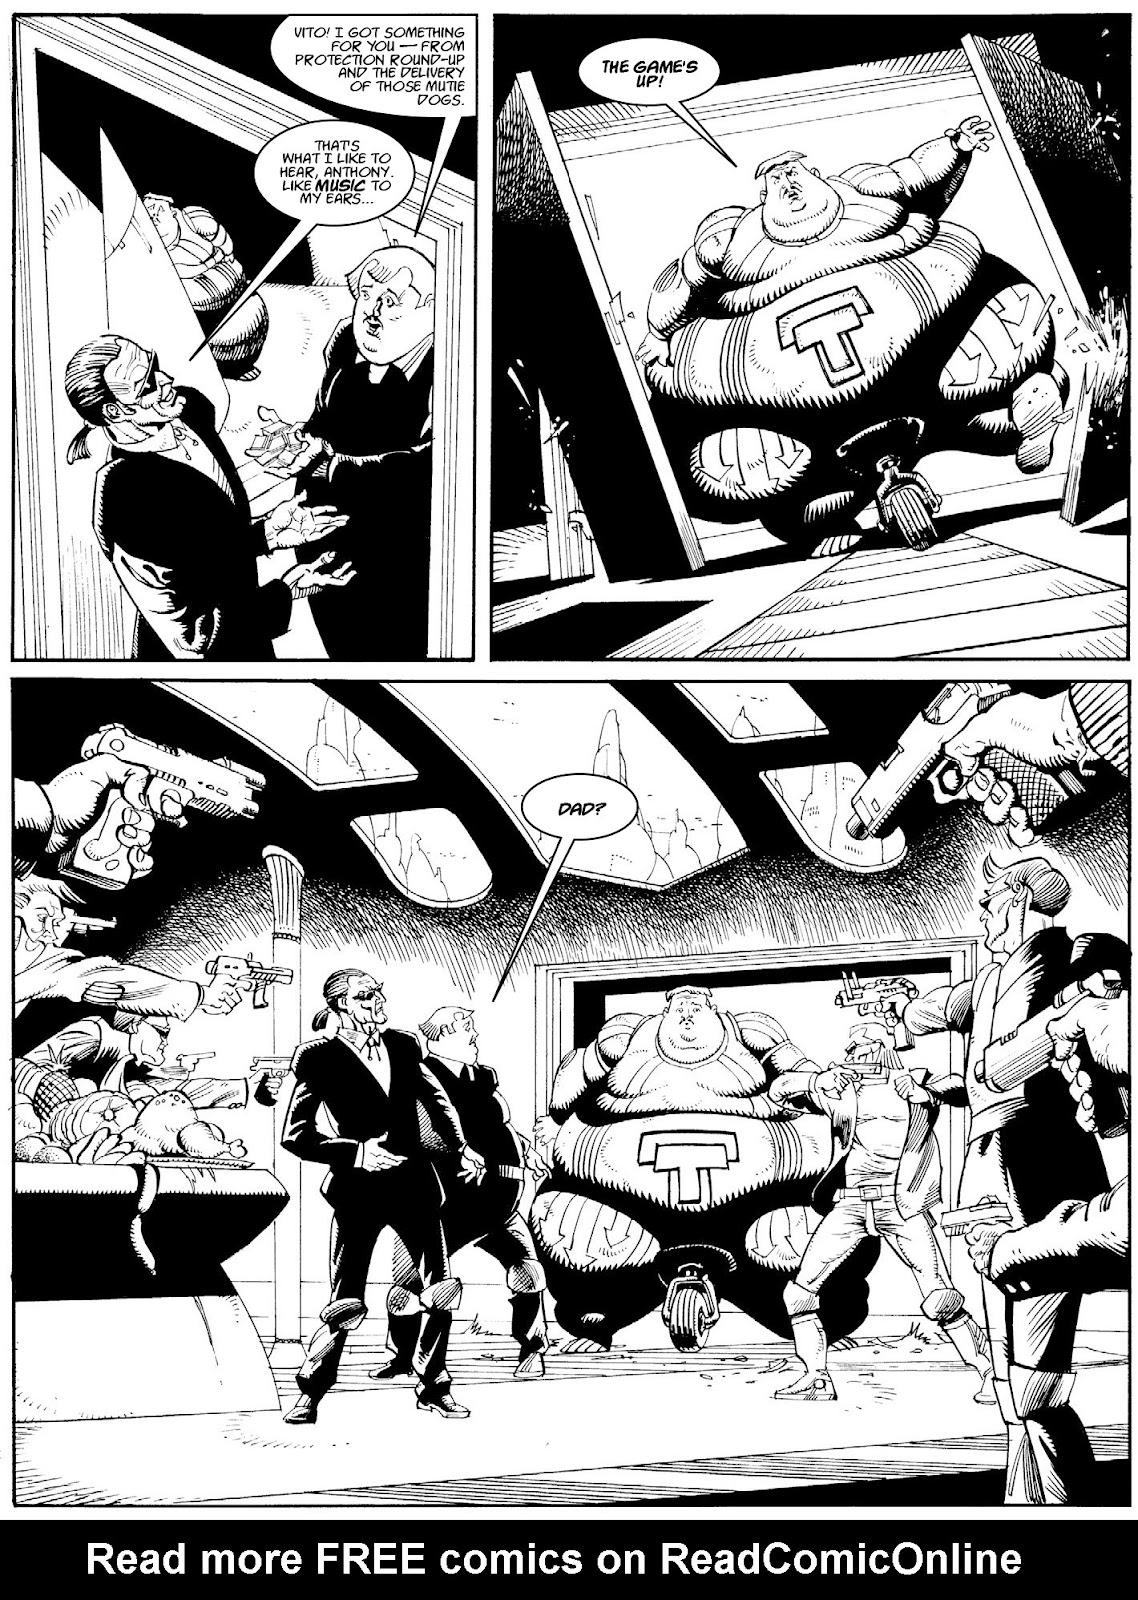 Judge Dredd Megazine (Vol. 5) issue 427 - Page 125